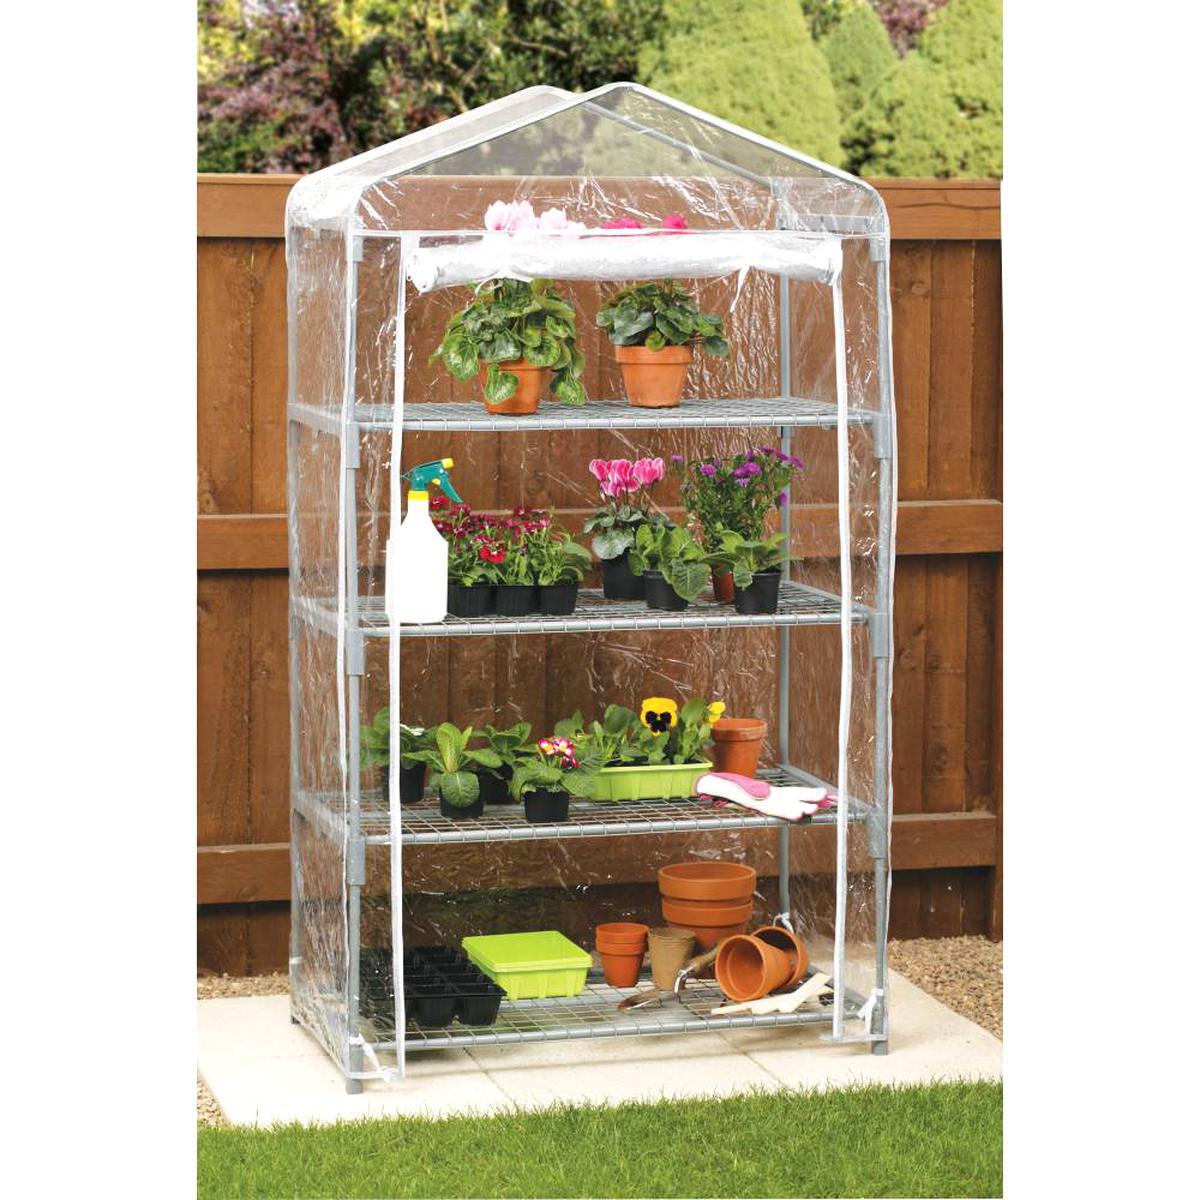 Mini Serre Jardin D'occasion | Plus Que 4 À -60% intérieur Mini Serres De Jardin